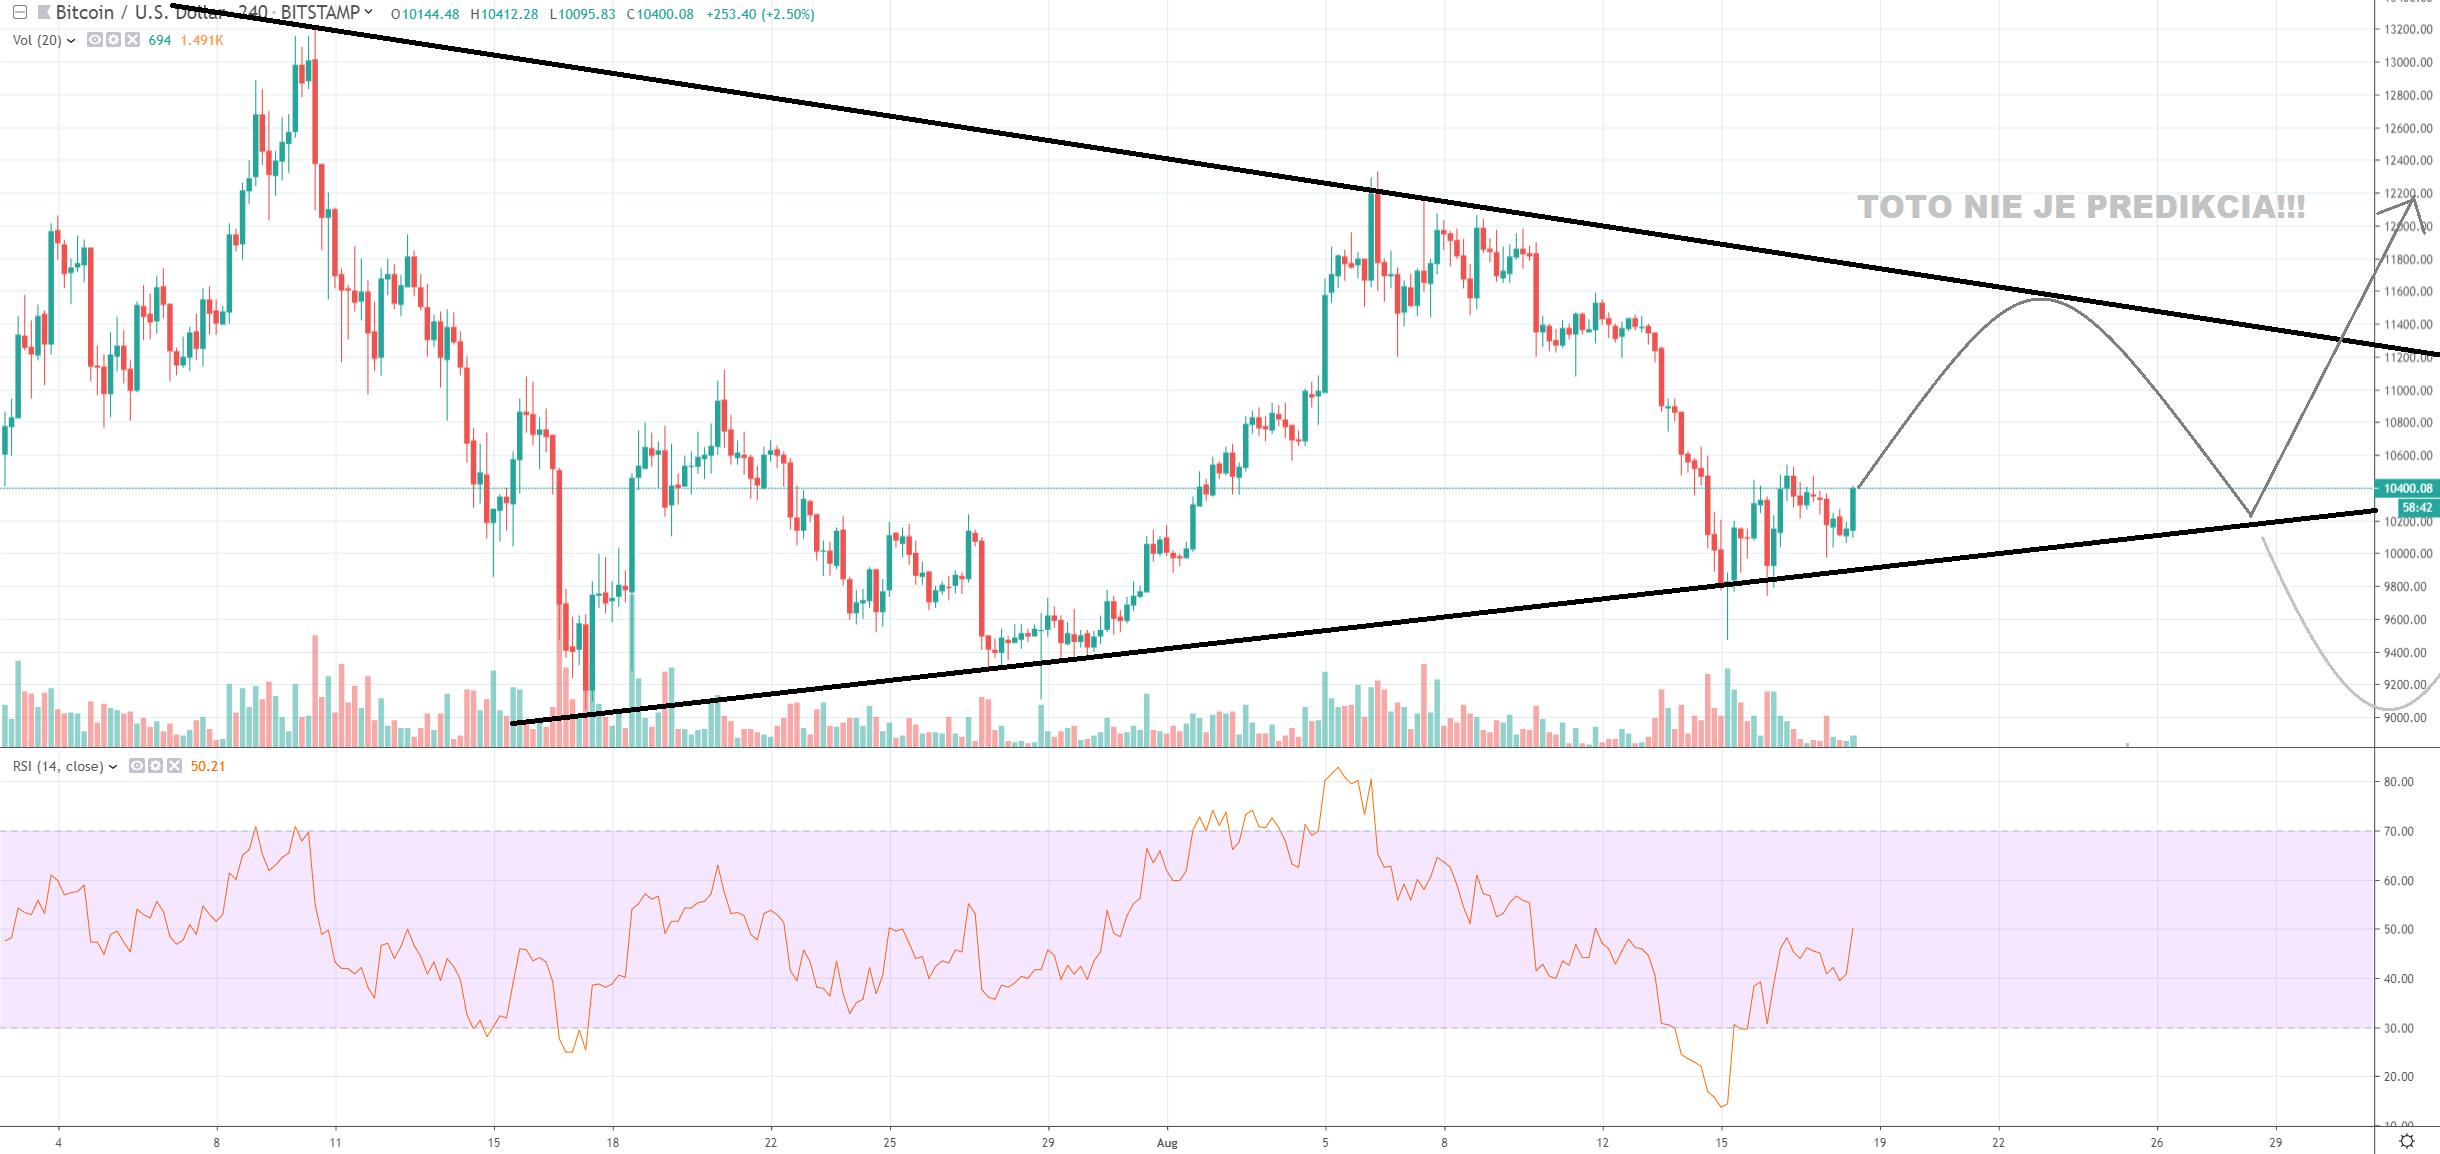 4h BTC/USD - Bitstamp